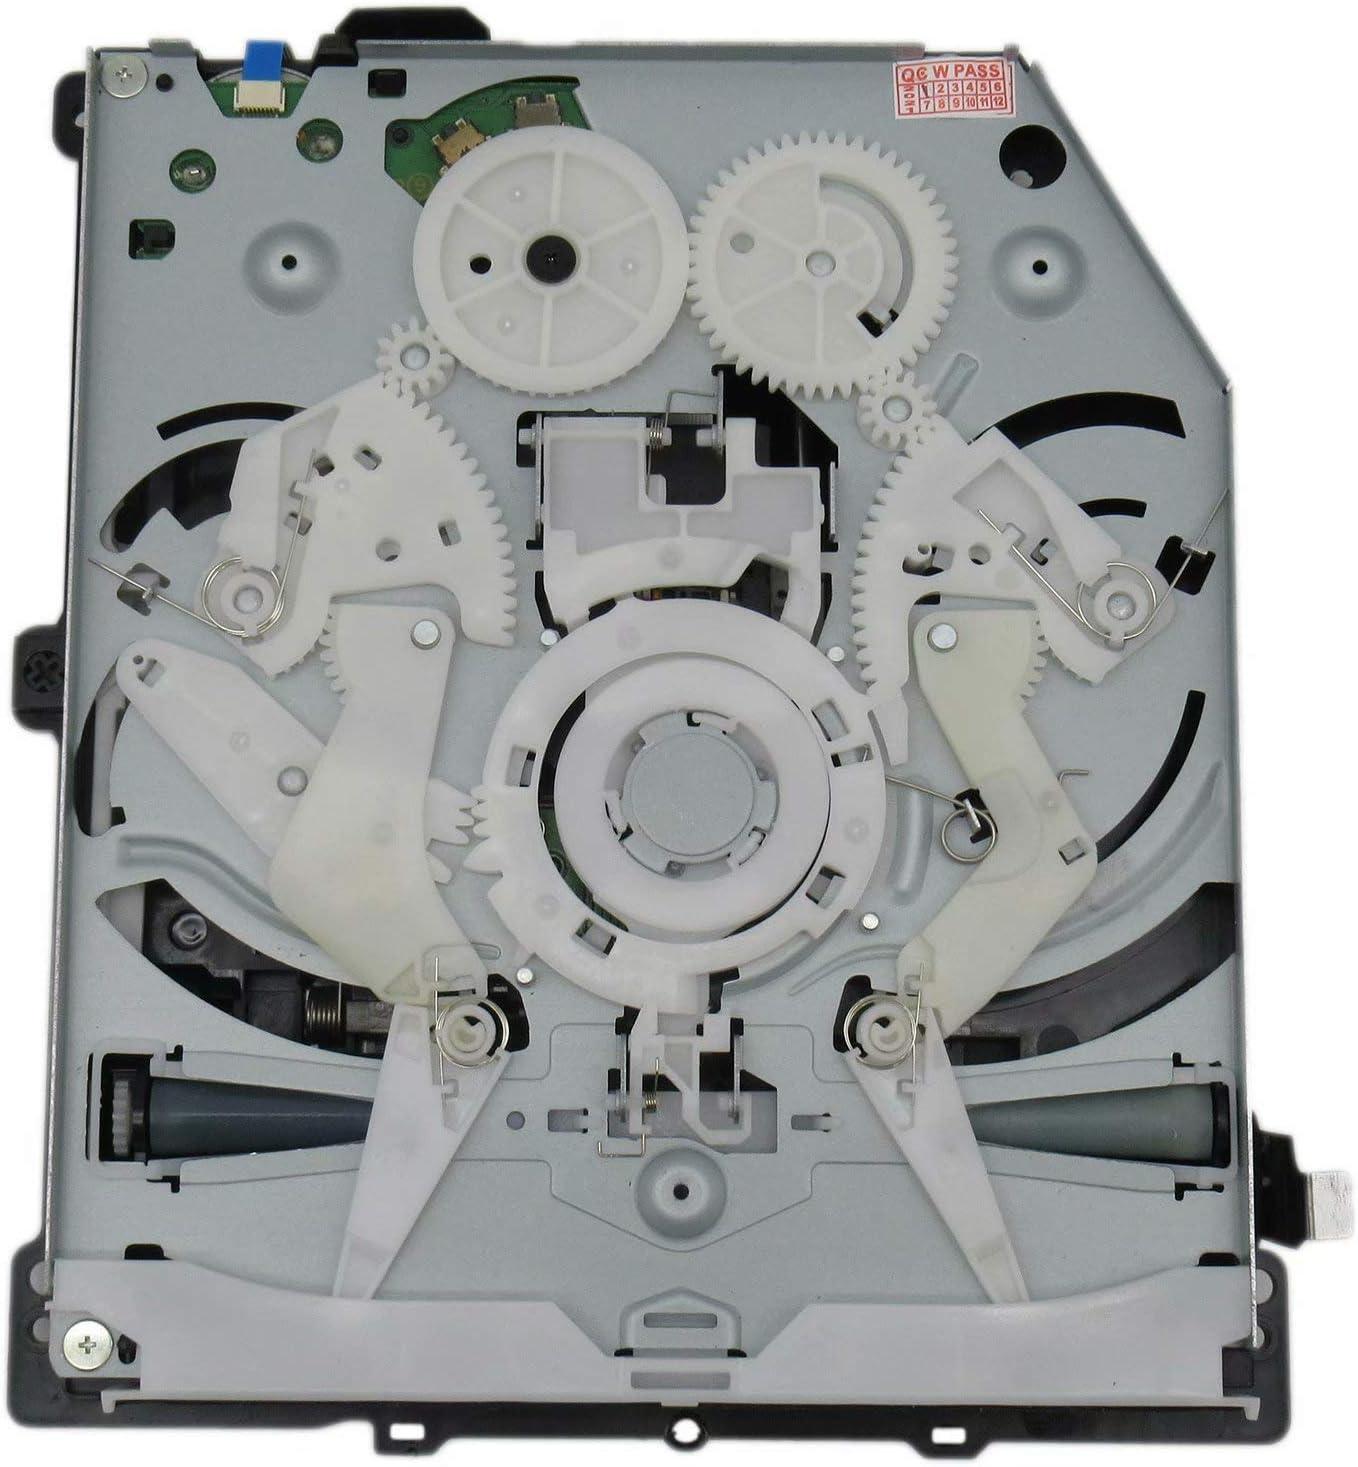 Gxcdizx KEM-490AAA Kansas City Mall Blu-Ray Popular Disk Laser Drive with KES-490